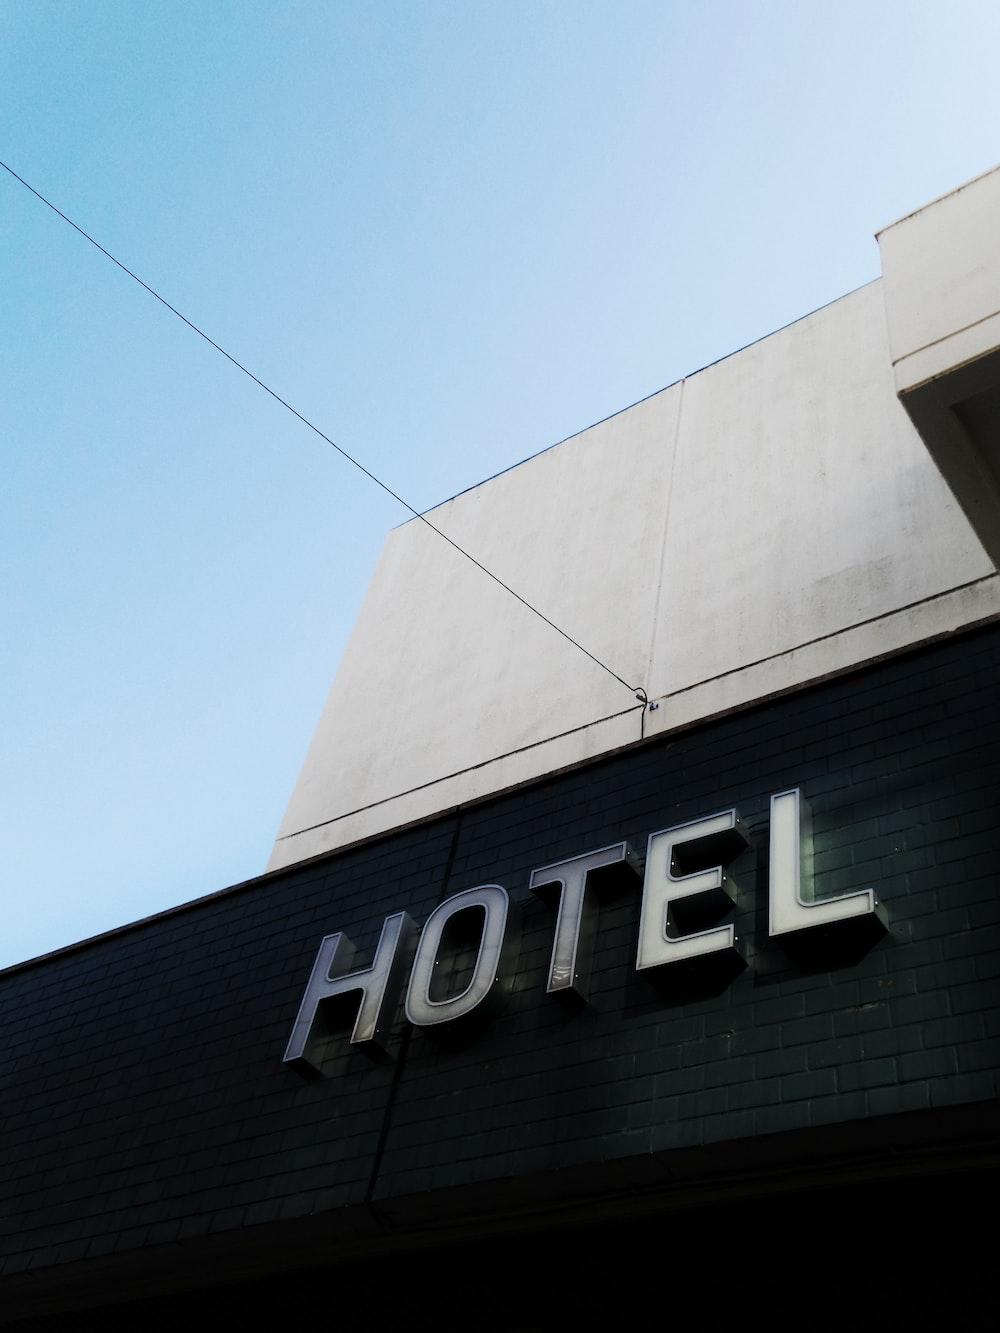 black and white concrete hotel building under a calm blue sky